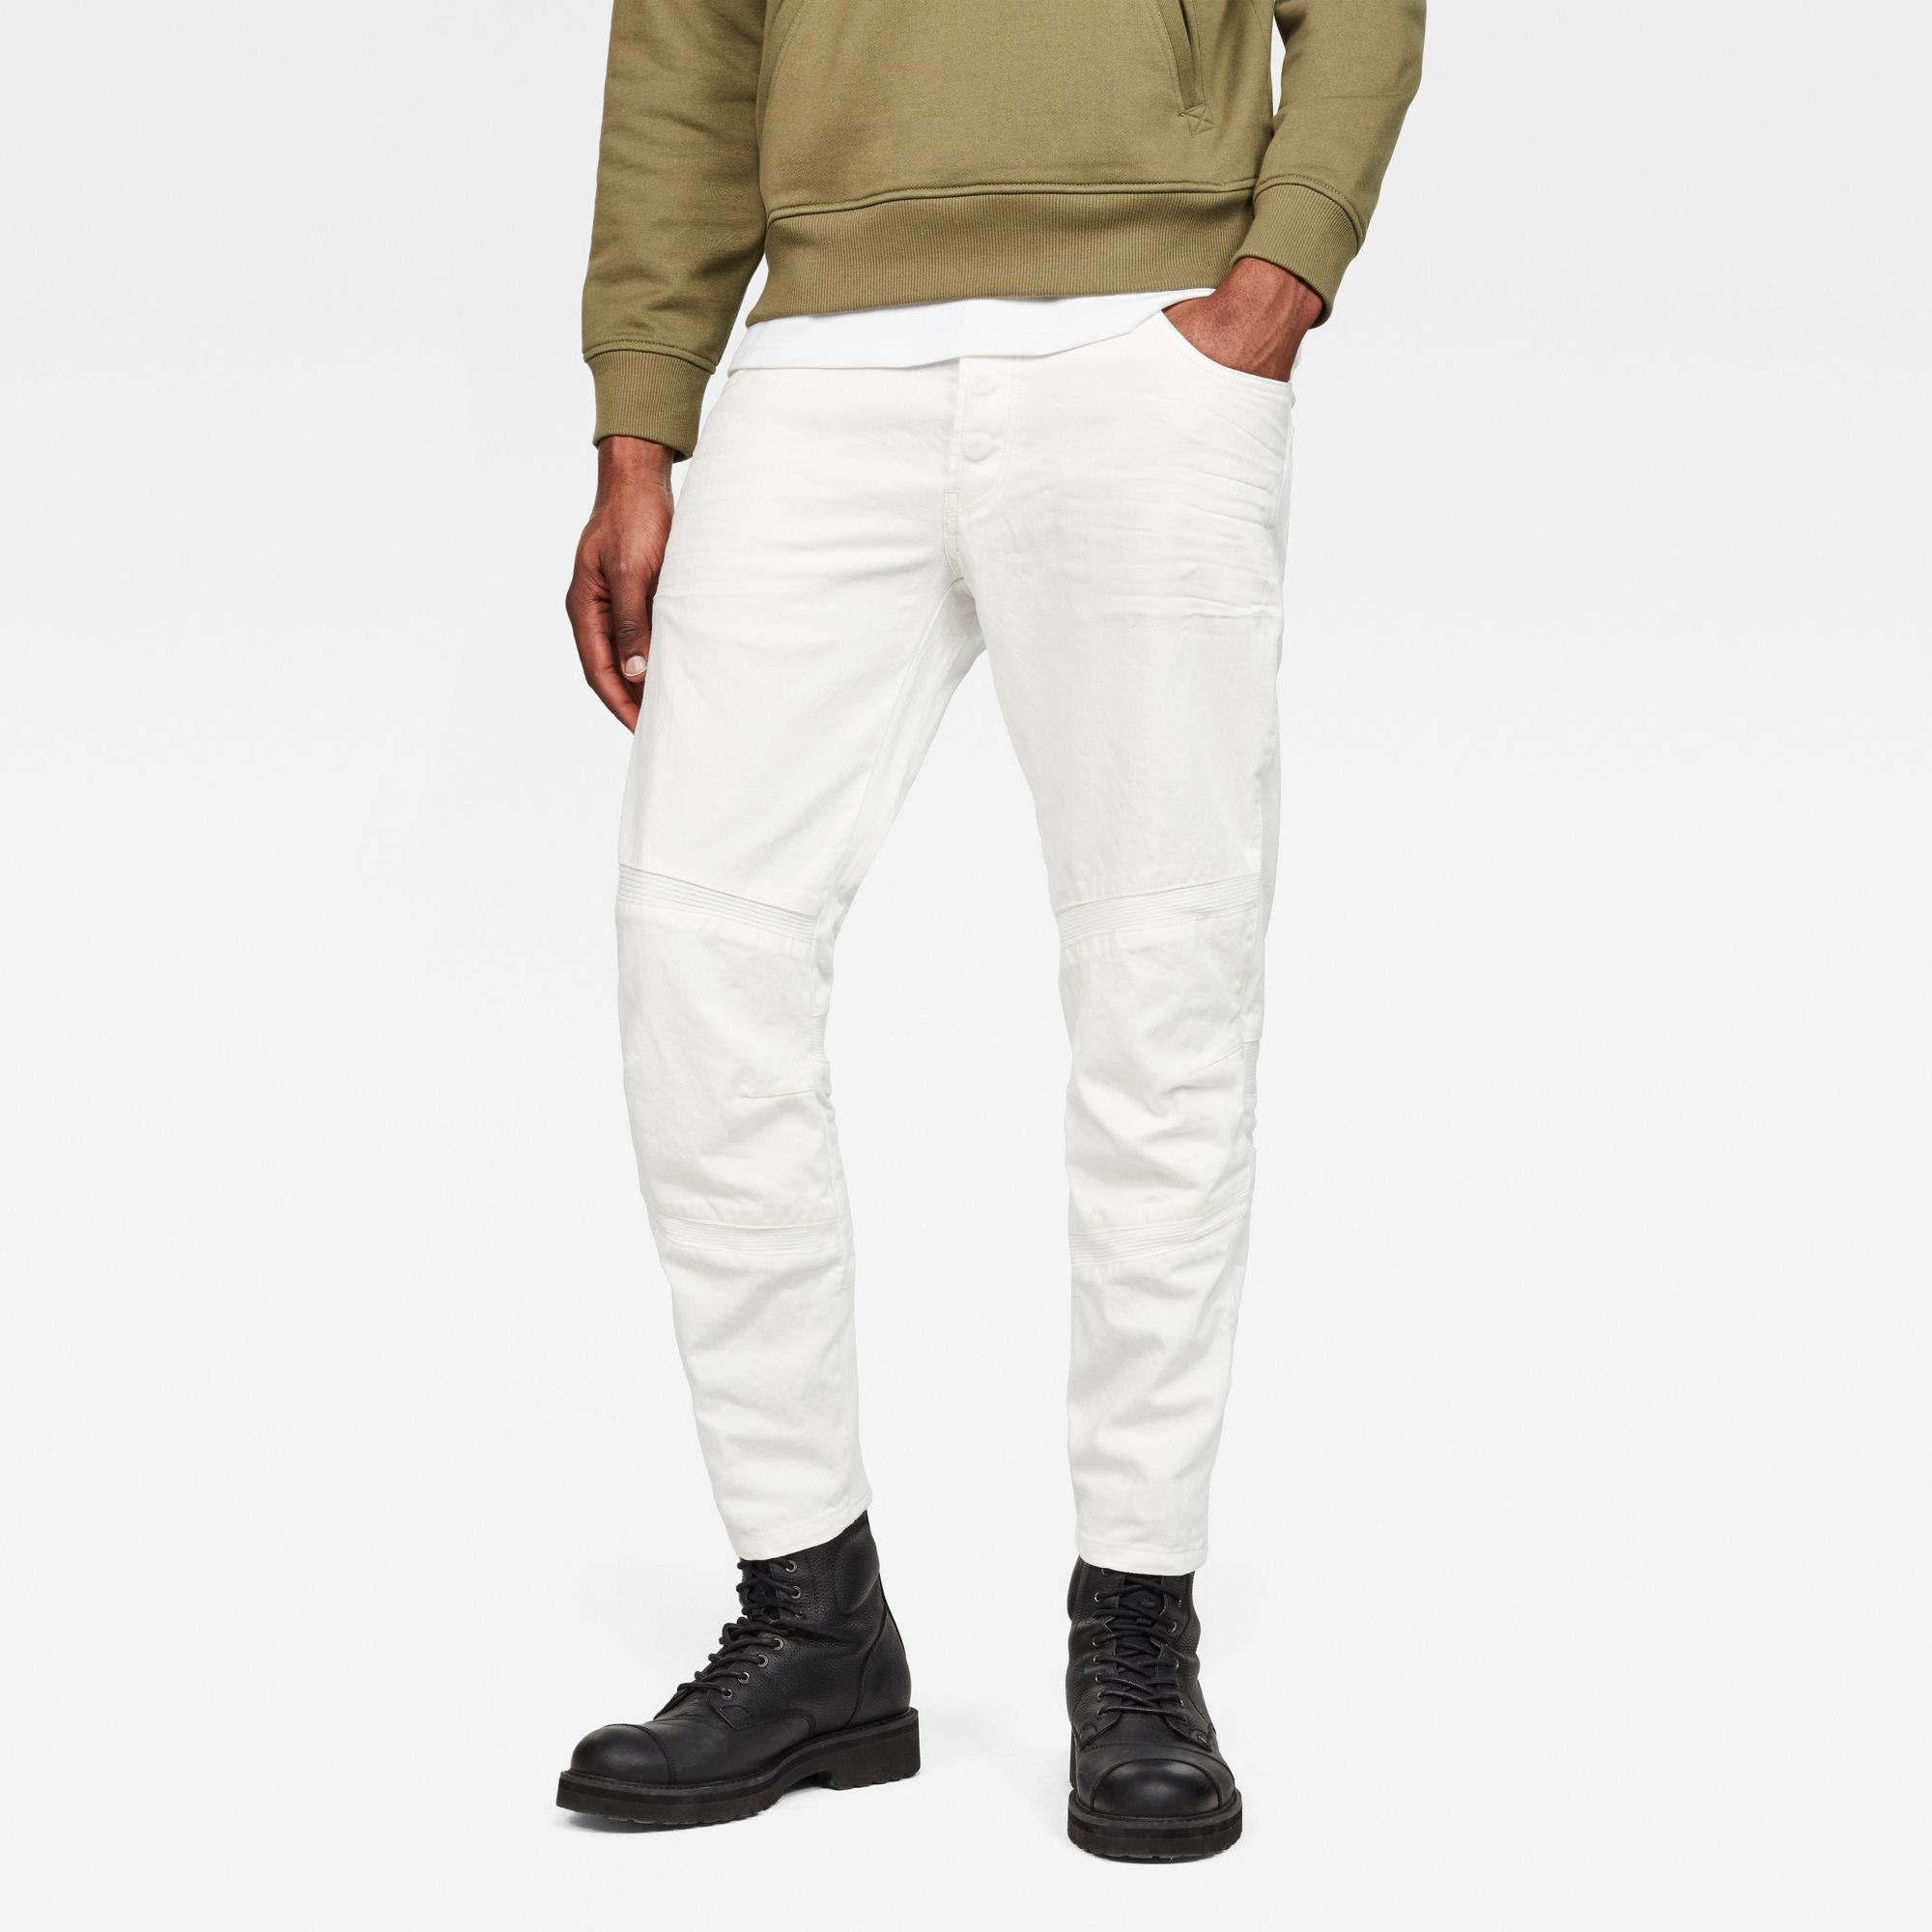 Motac Deconstructed 3D Slim Cropped Jeans